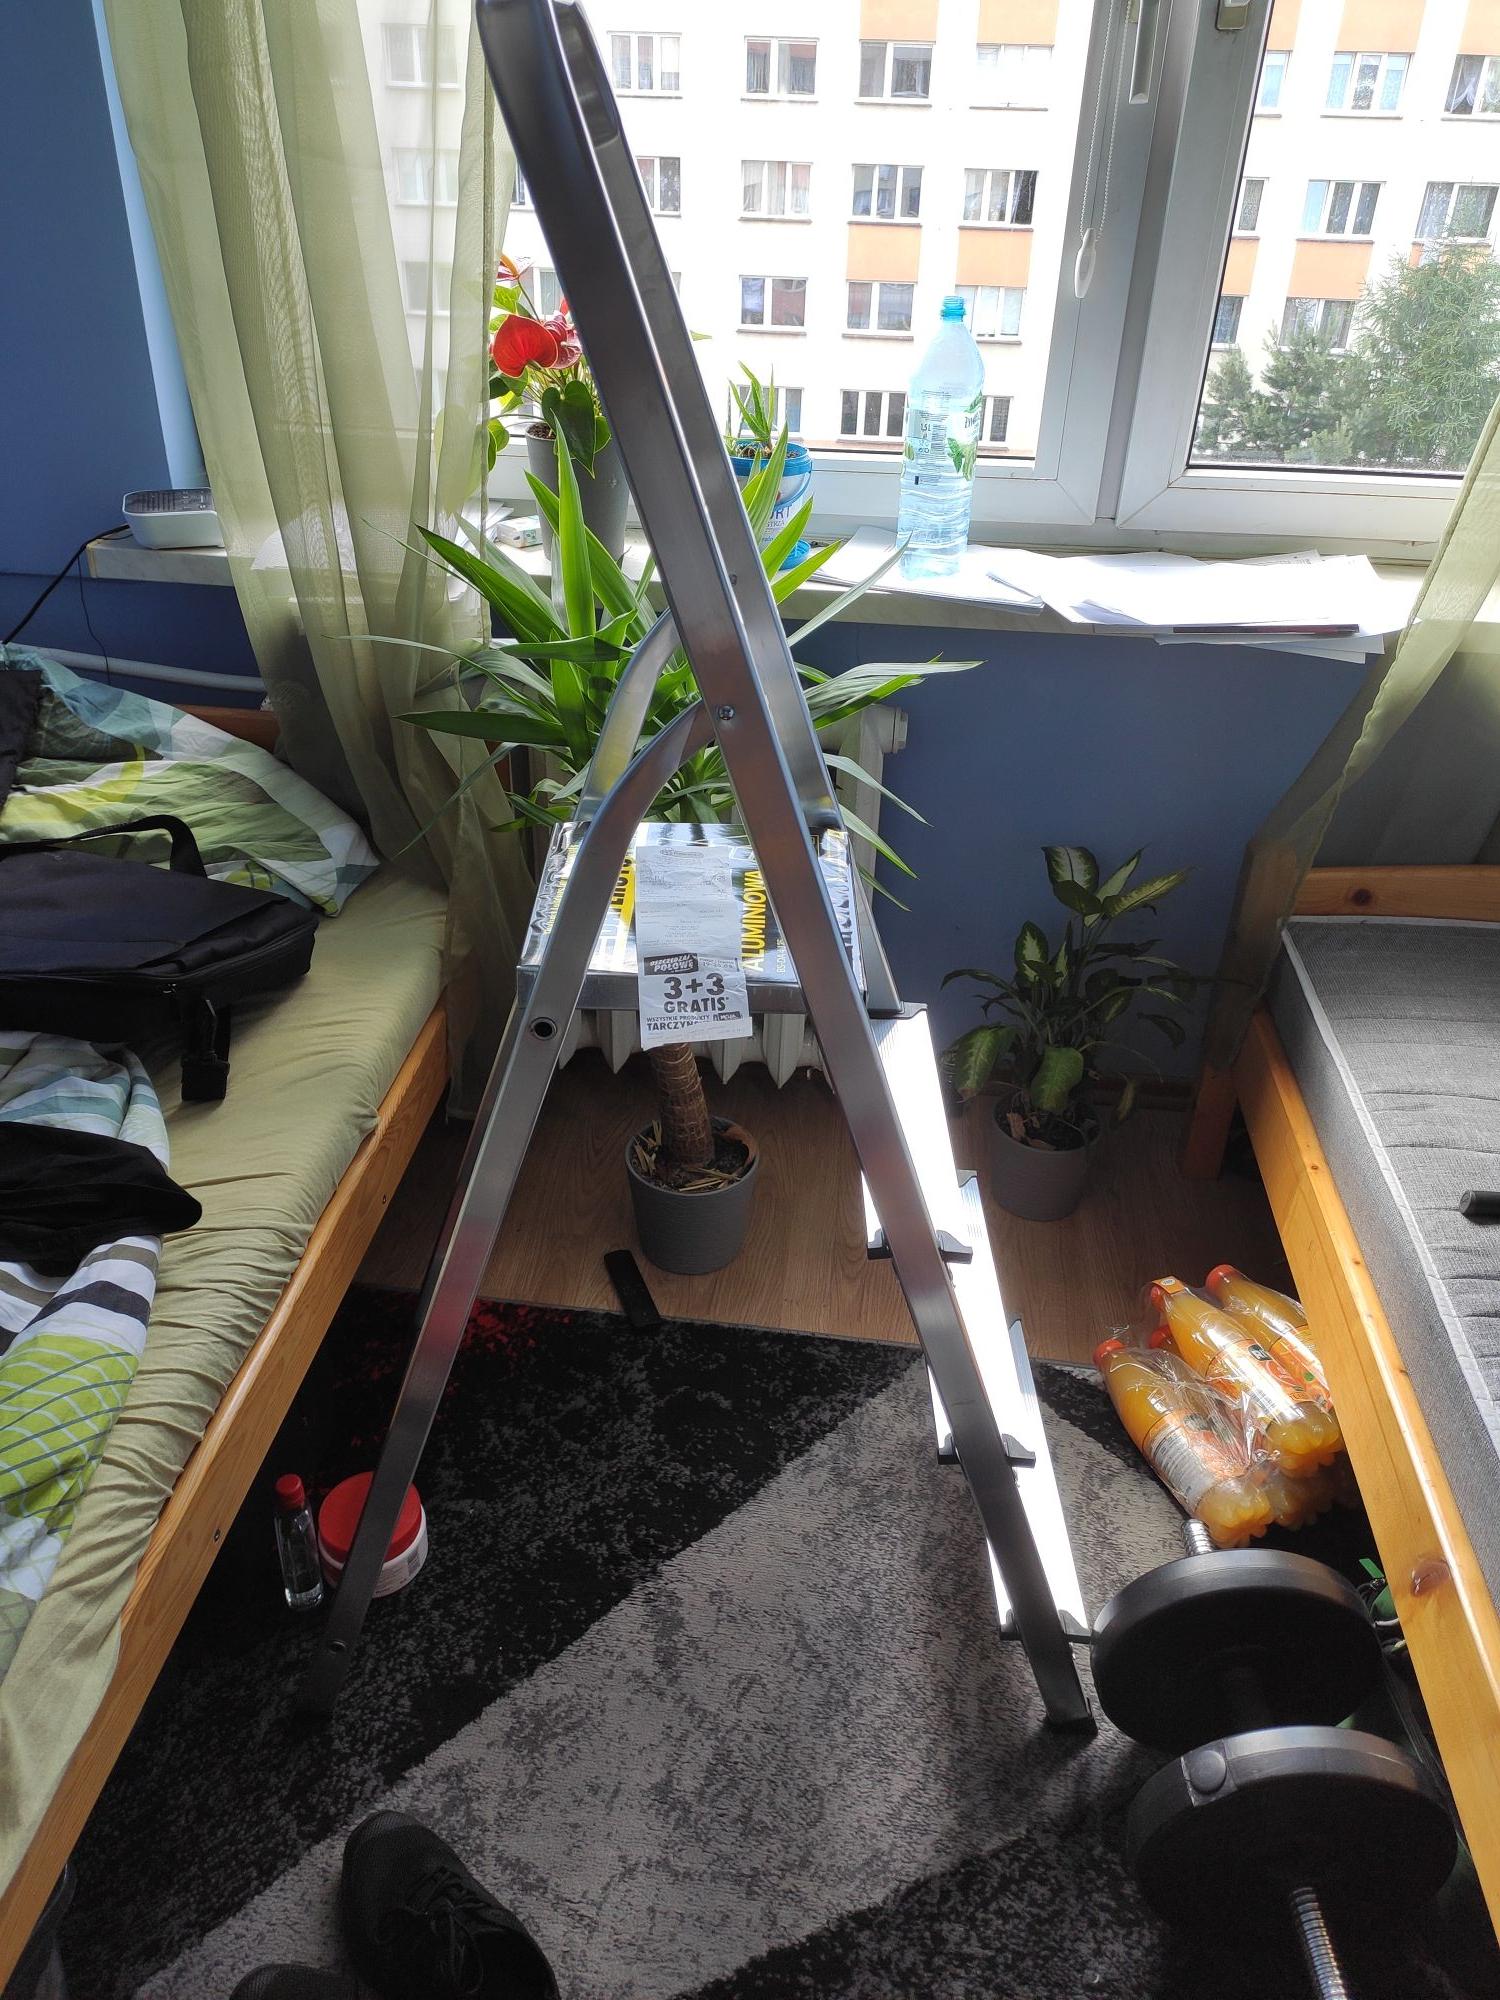 Drabina aluminiowa biedronka cena za 2 sztuki